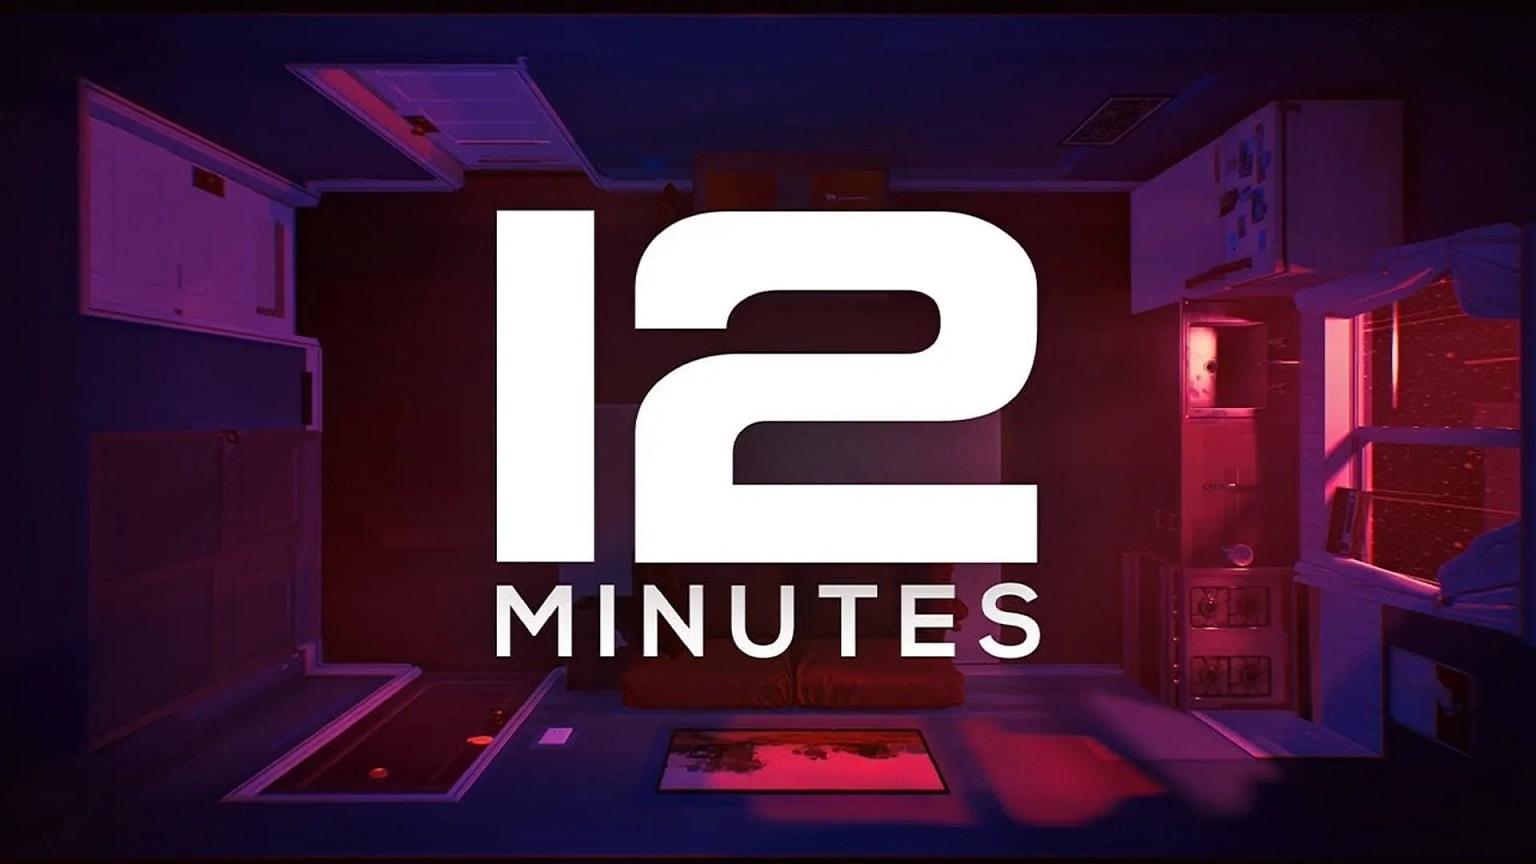 12 minutes gra